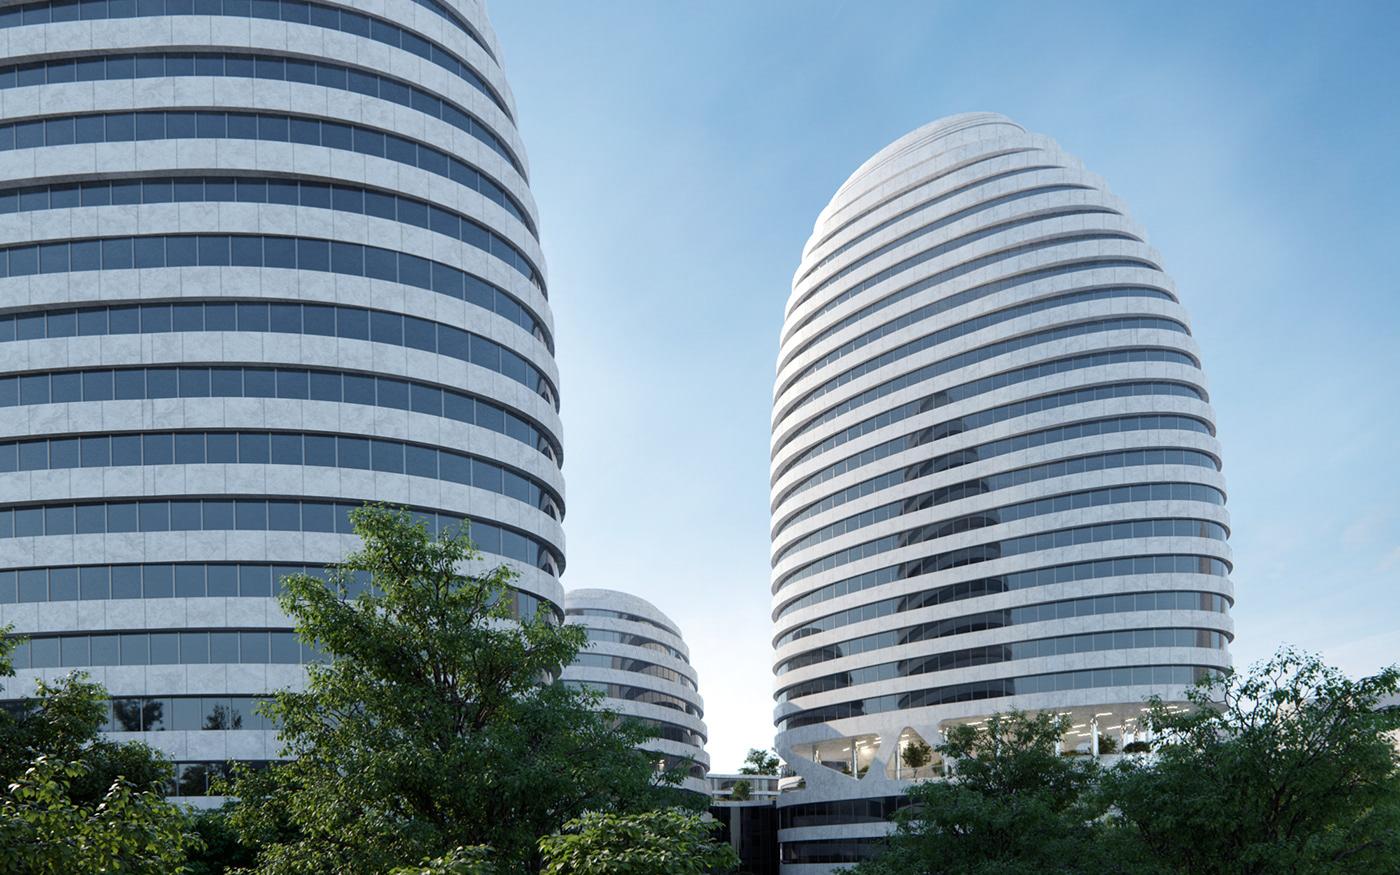 coronarenderer architecture visualization Render 3dsmax residential housing Urban apartments